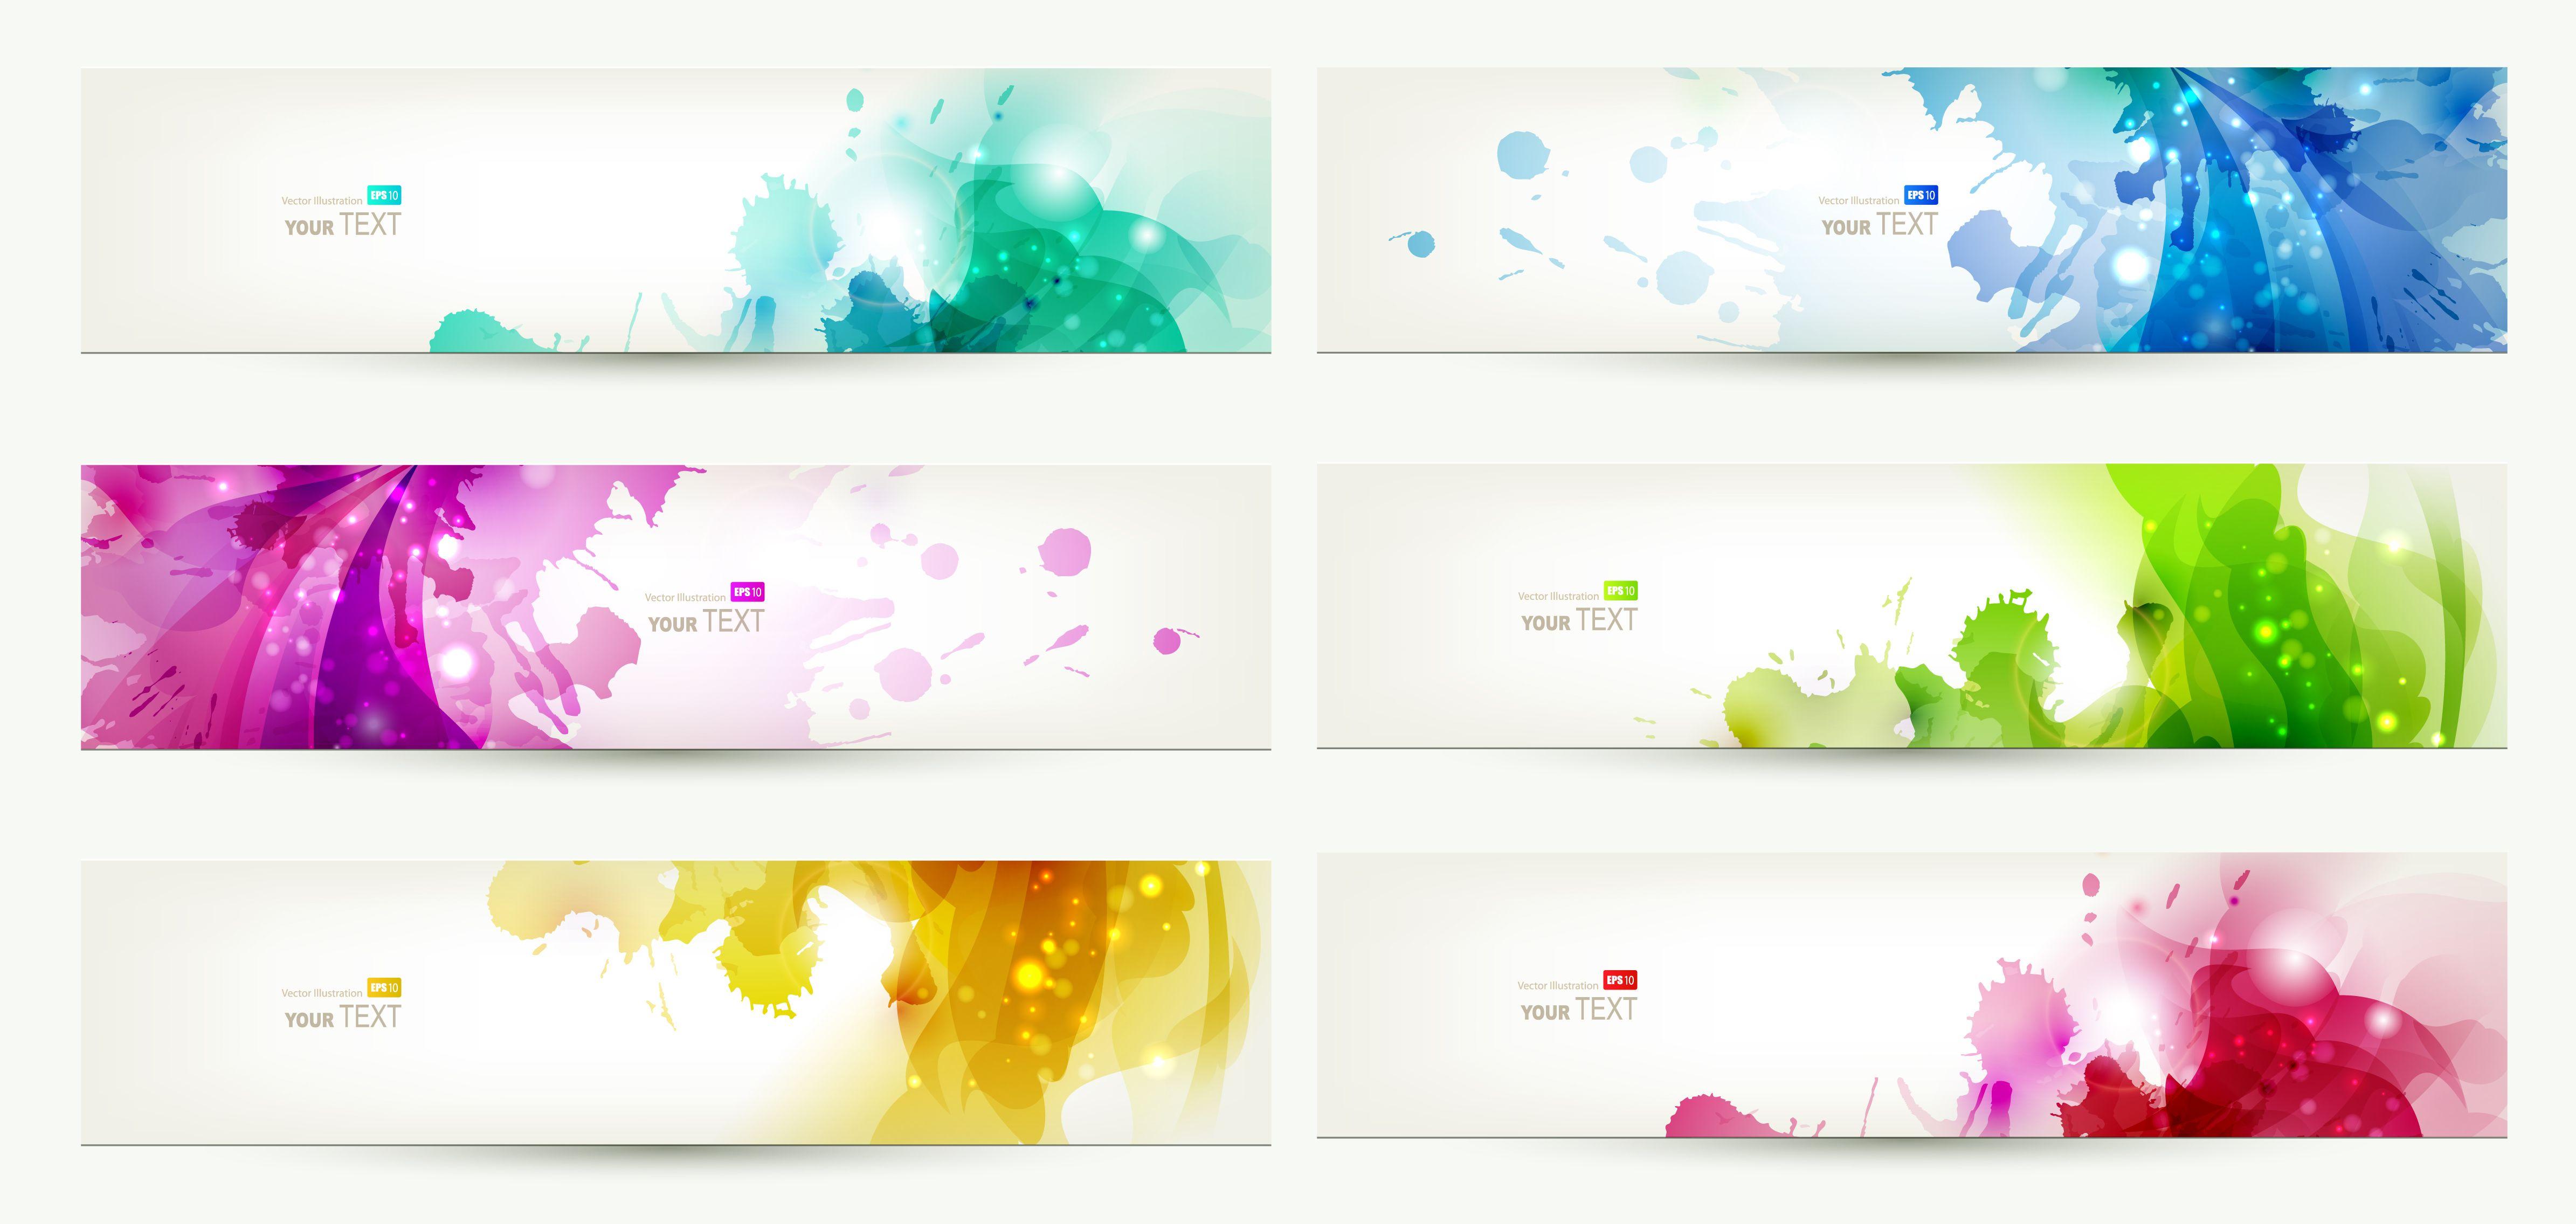 Free Vector Banner Templates | Banner design | Pinterest | Banner ...